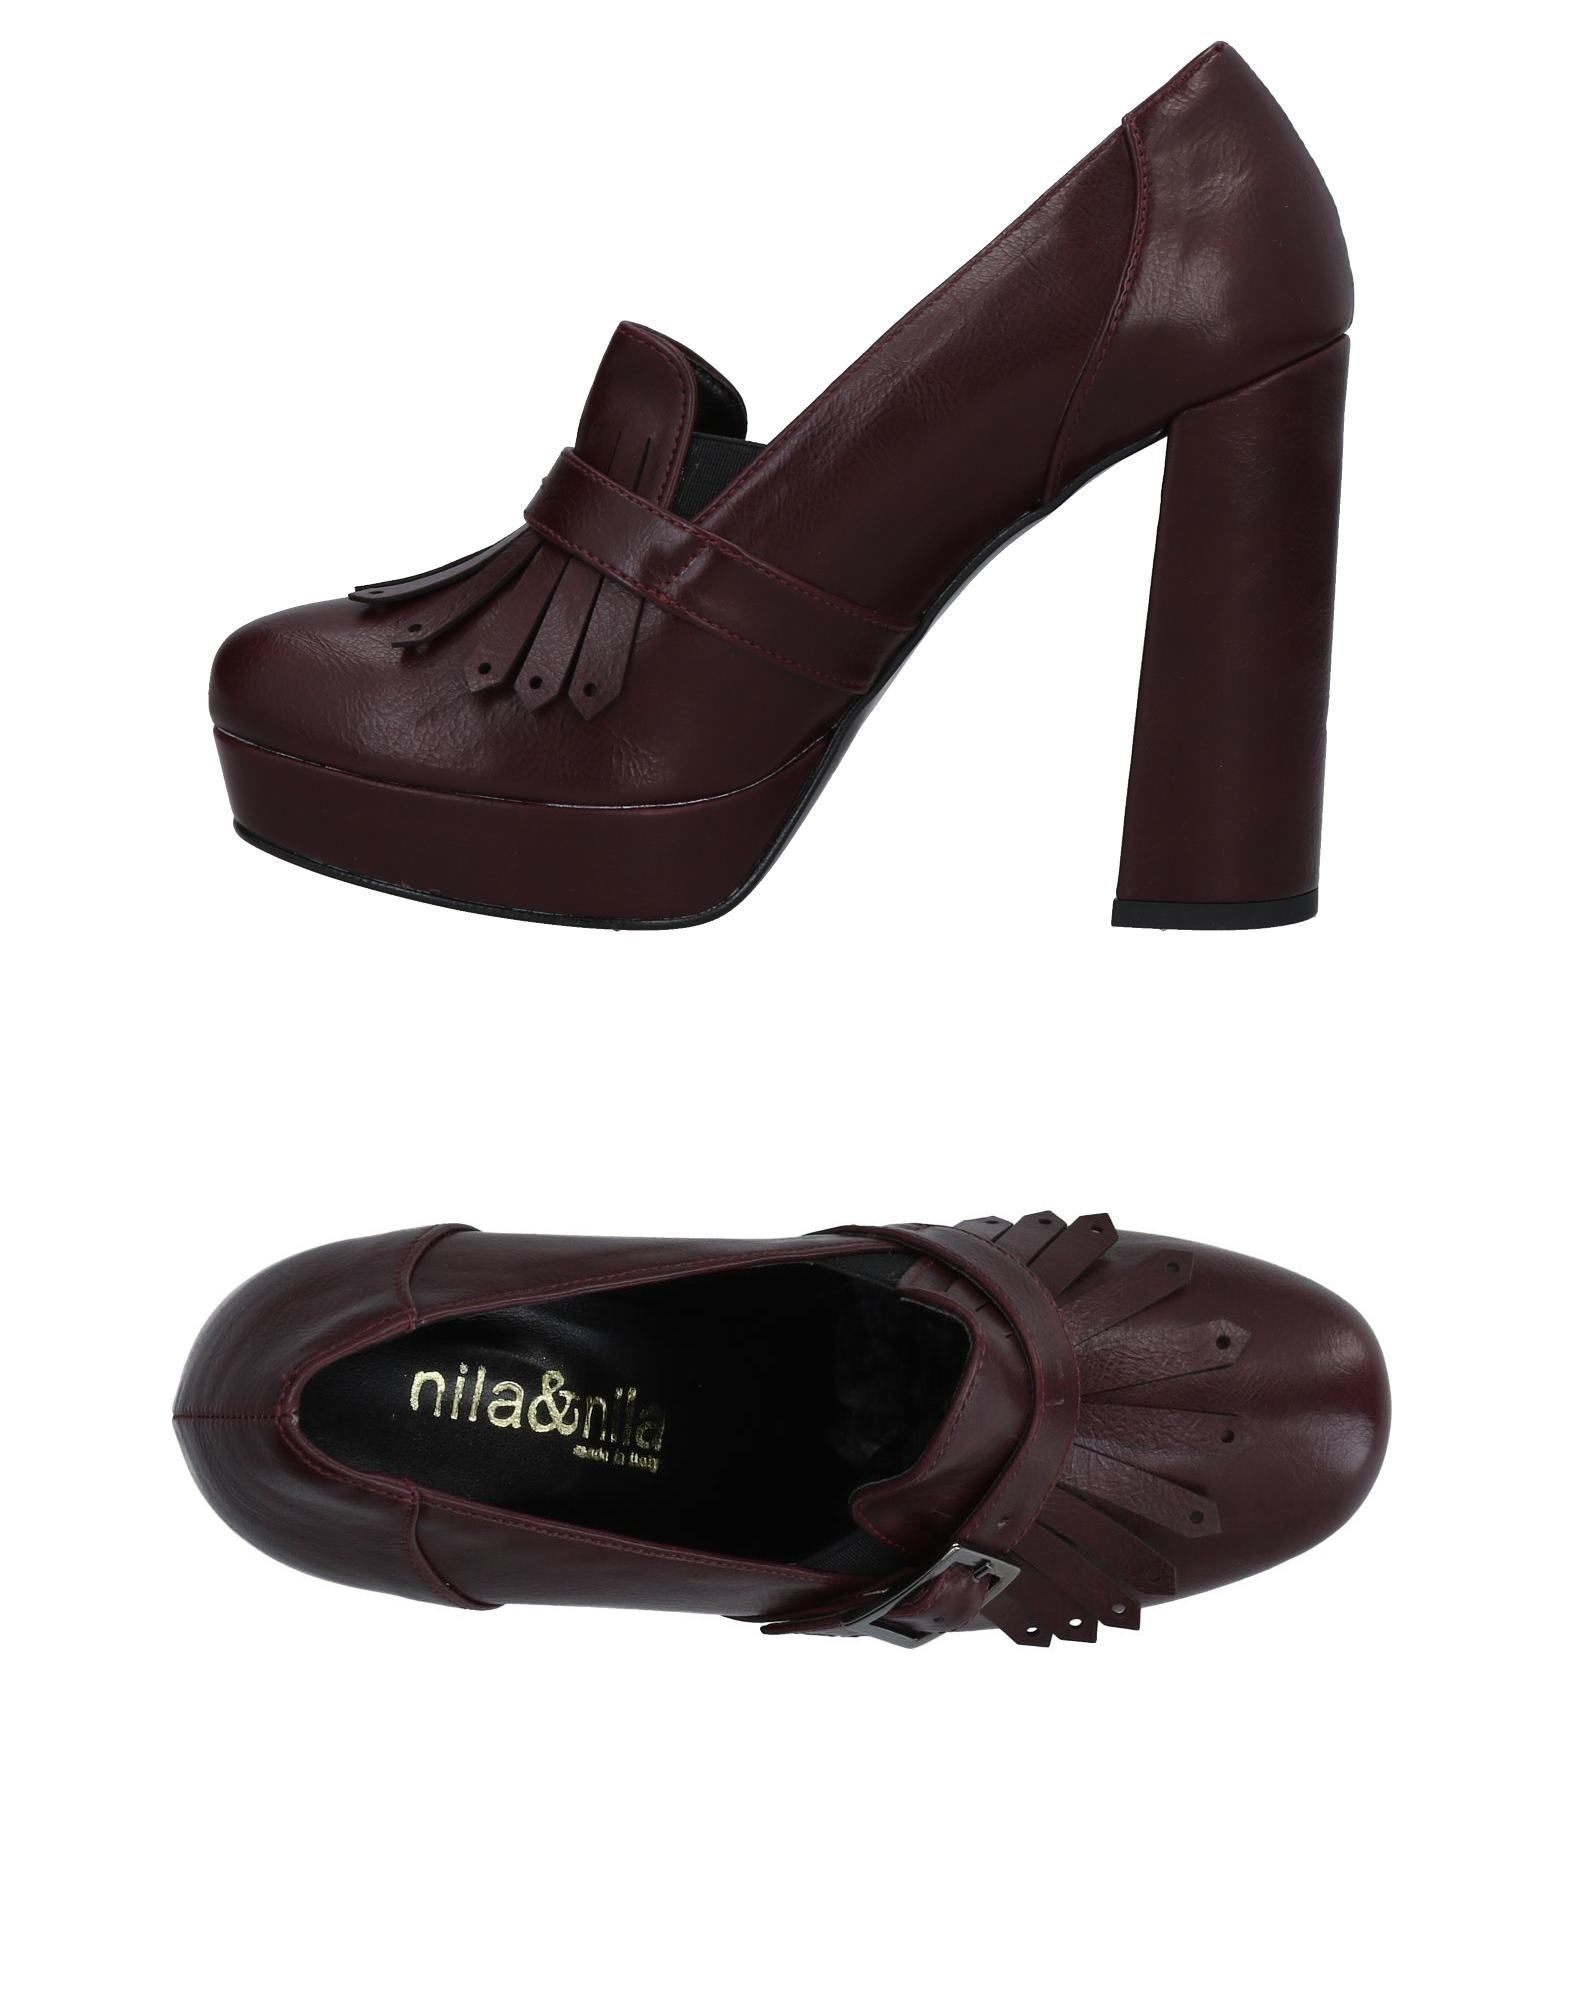 Nila & Nila Mokassins Damen  11478742SN Gute Qualität beliebte Schuhe